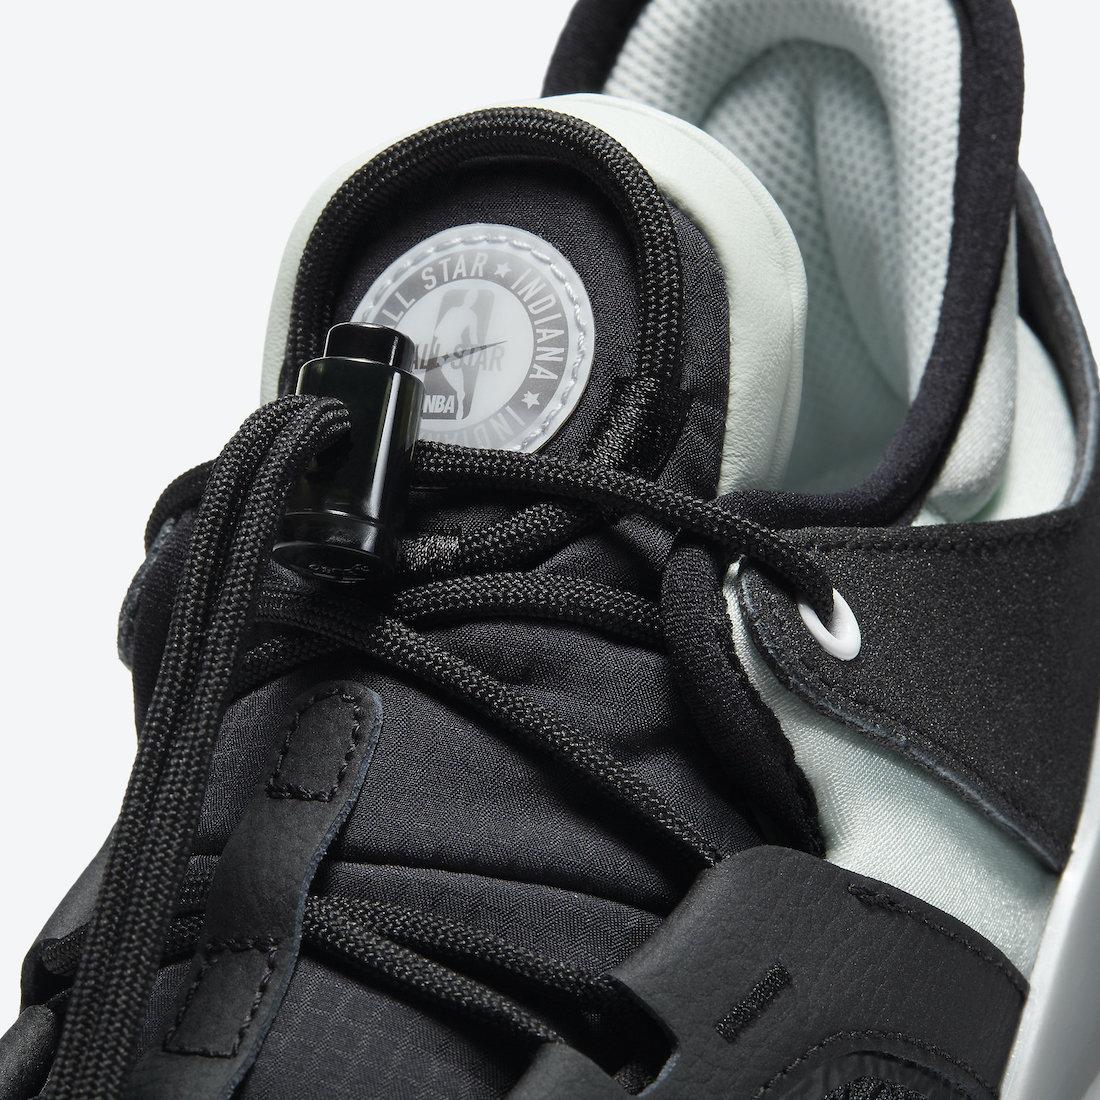 Nike D/MS/X Distorted DNA All-Star DA7255-001 Release Date Info